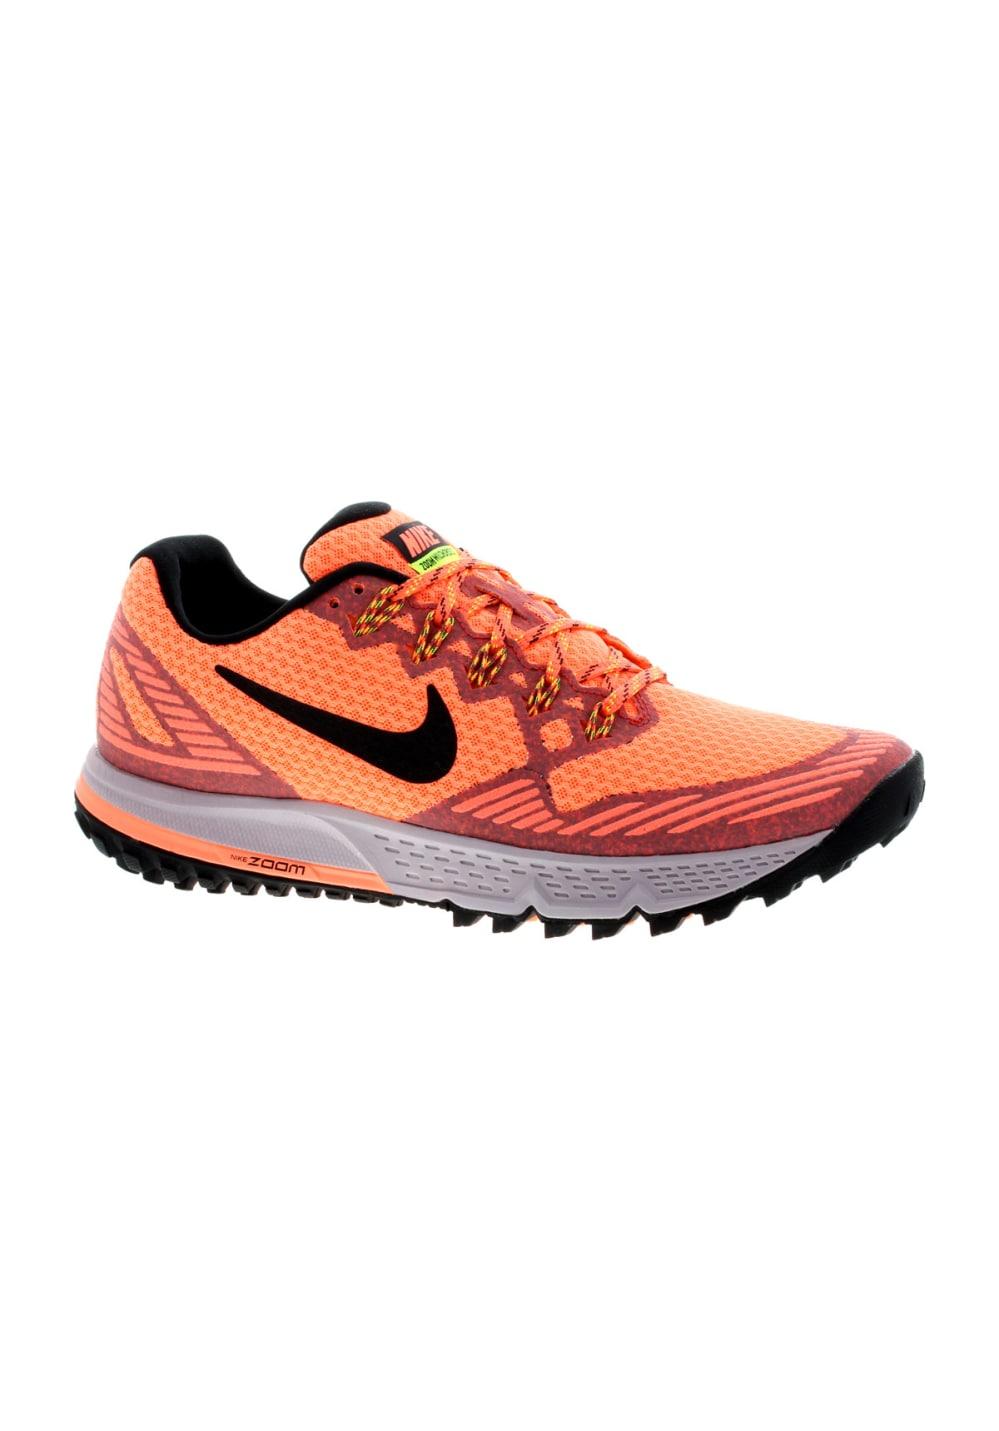 nouveau style 4ae22 ab016 Nike Air Zoom Wildhorse 3 - Laufschuhe für Damen - Orange